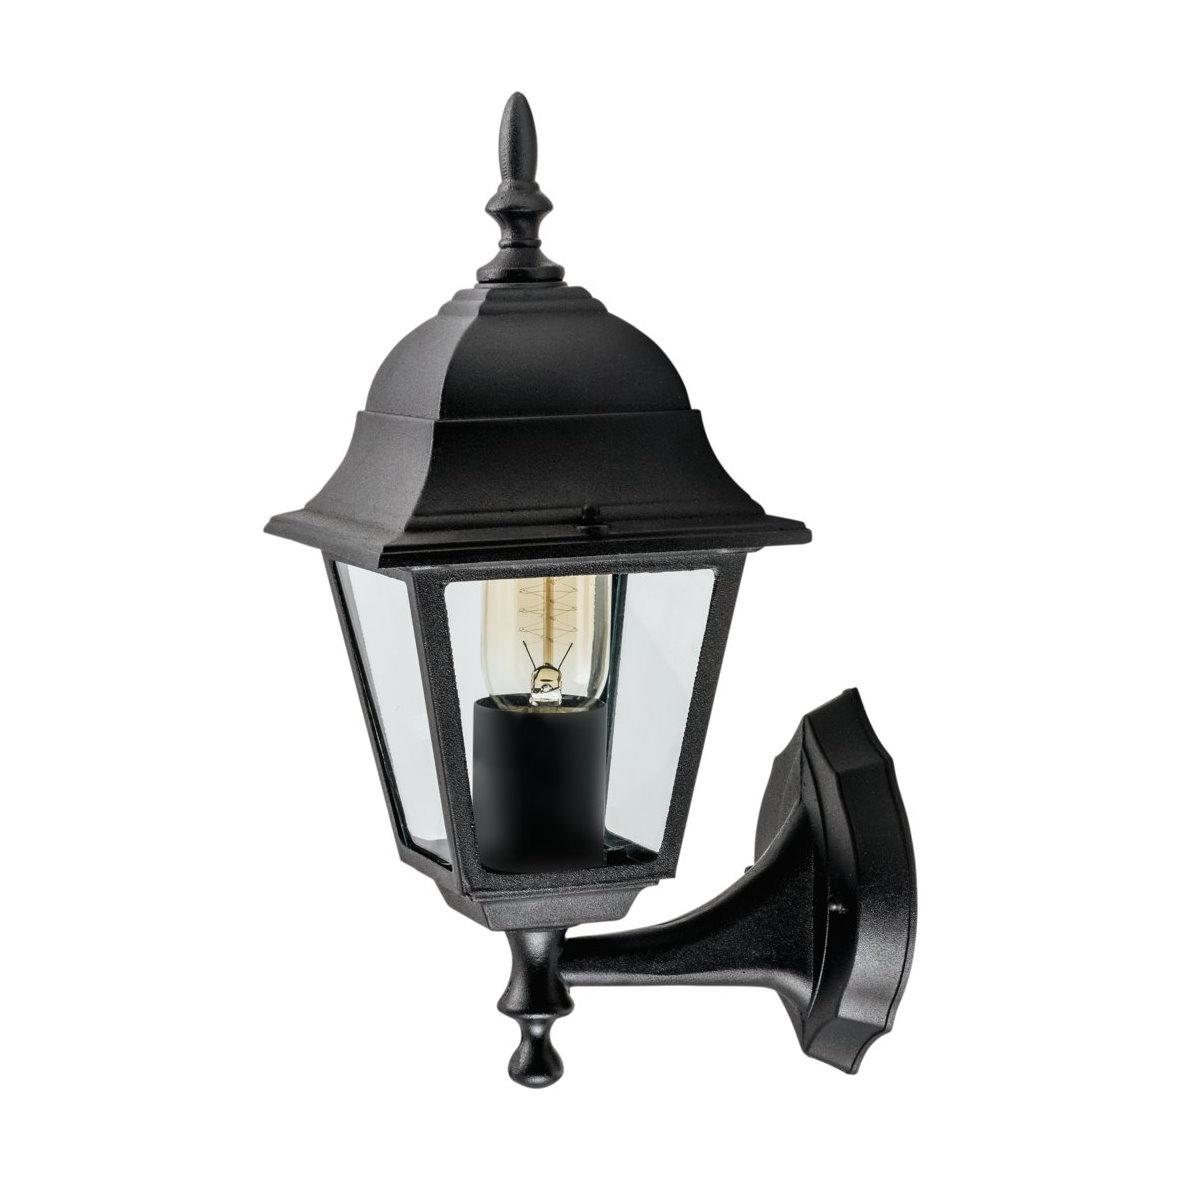 vintage leuchte retro wandleuchte antik alu lampe landhaus. Black Bedroom Furniture Sets. Home Design Ideas